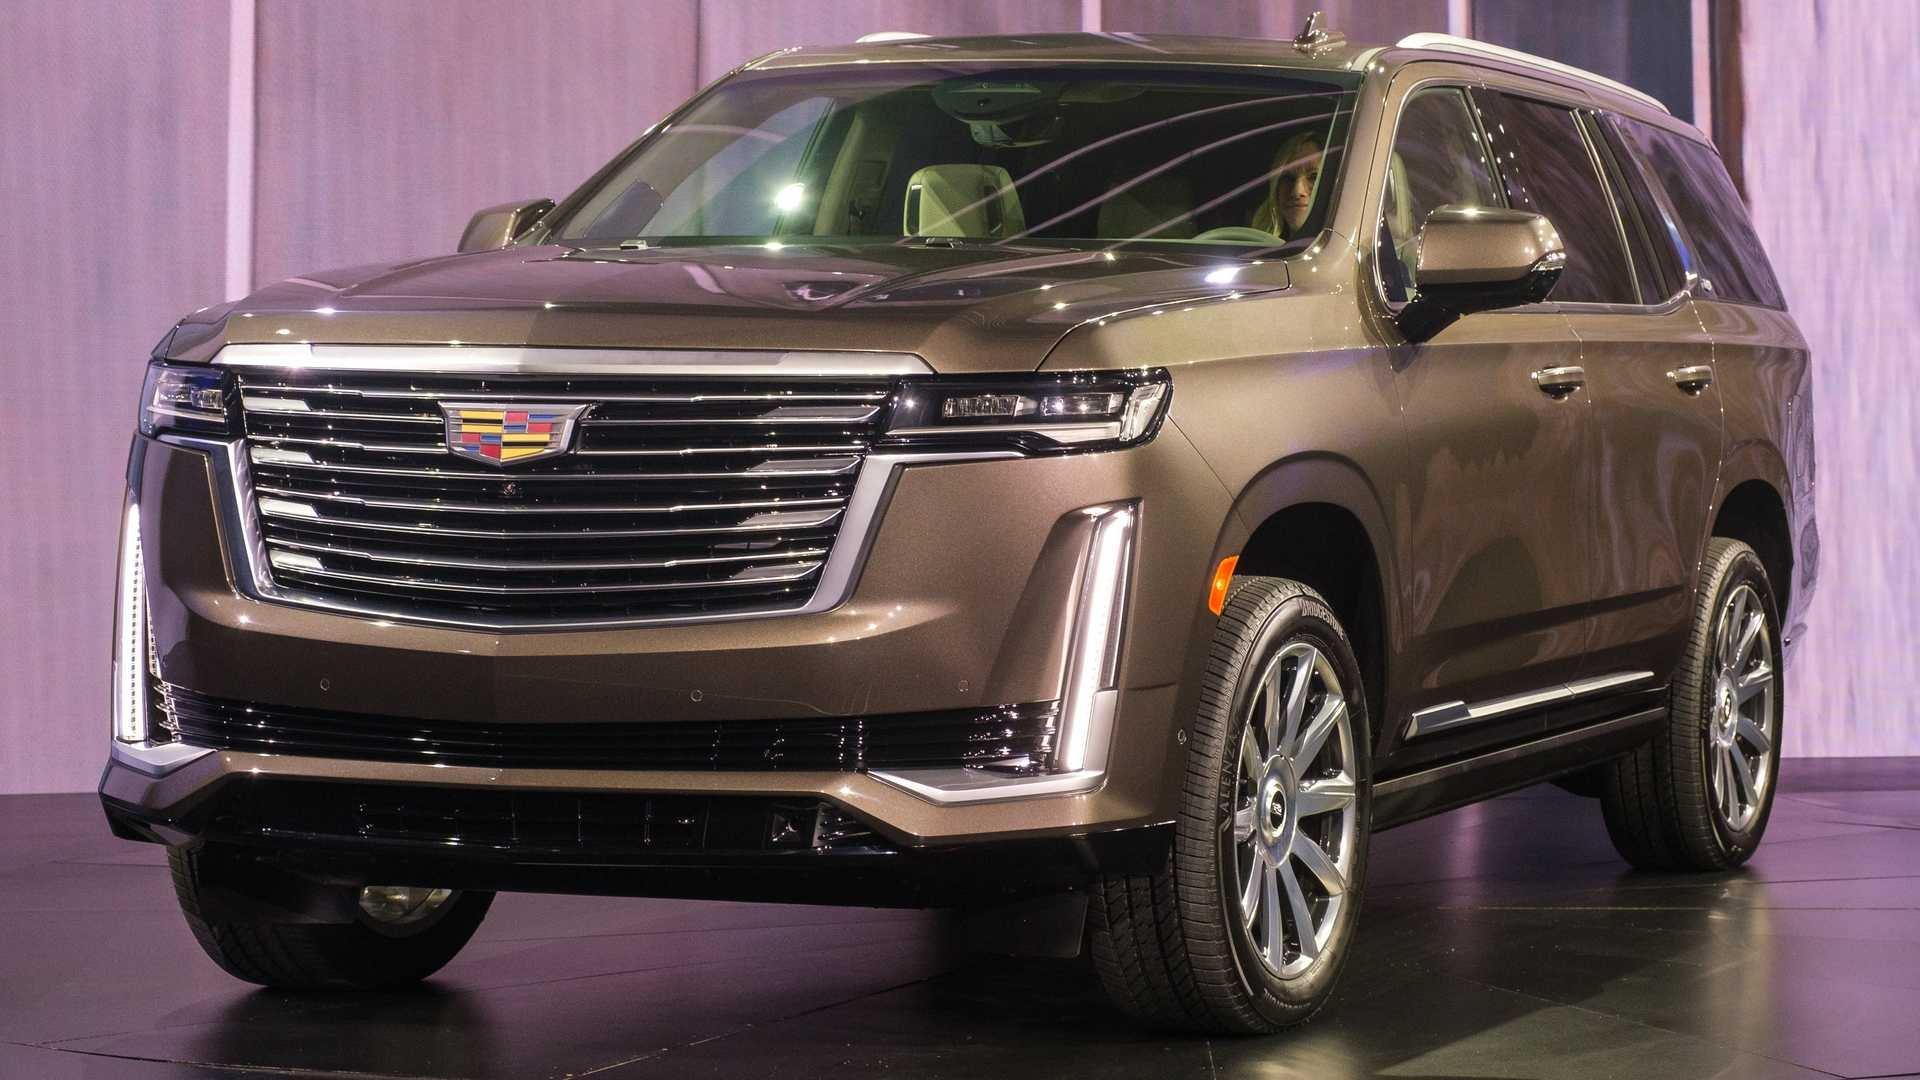 High-Performance Escalade-V Has Demand, Cadillac Admits